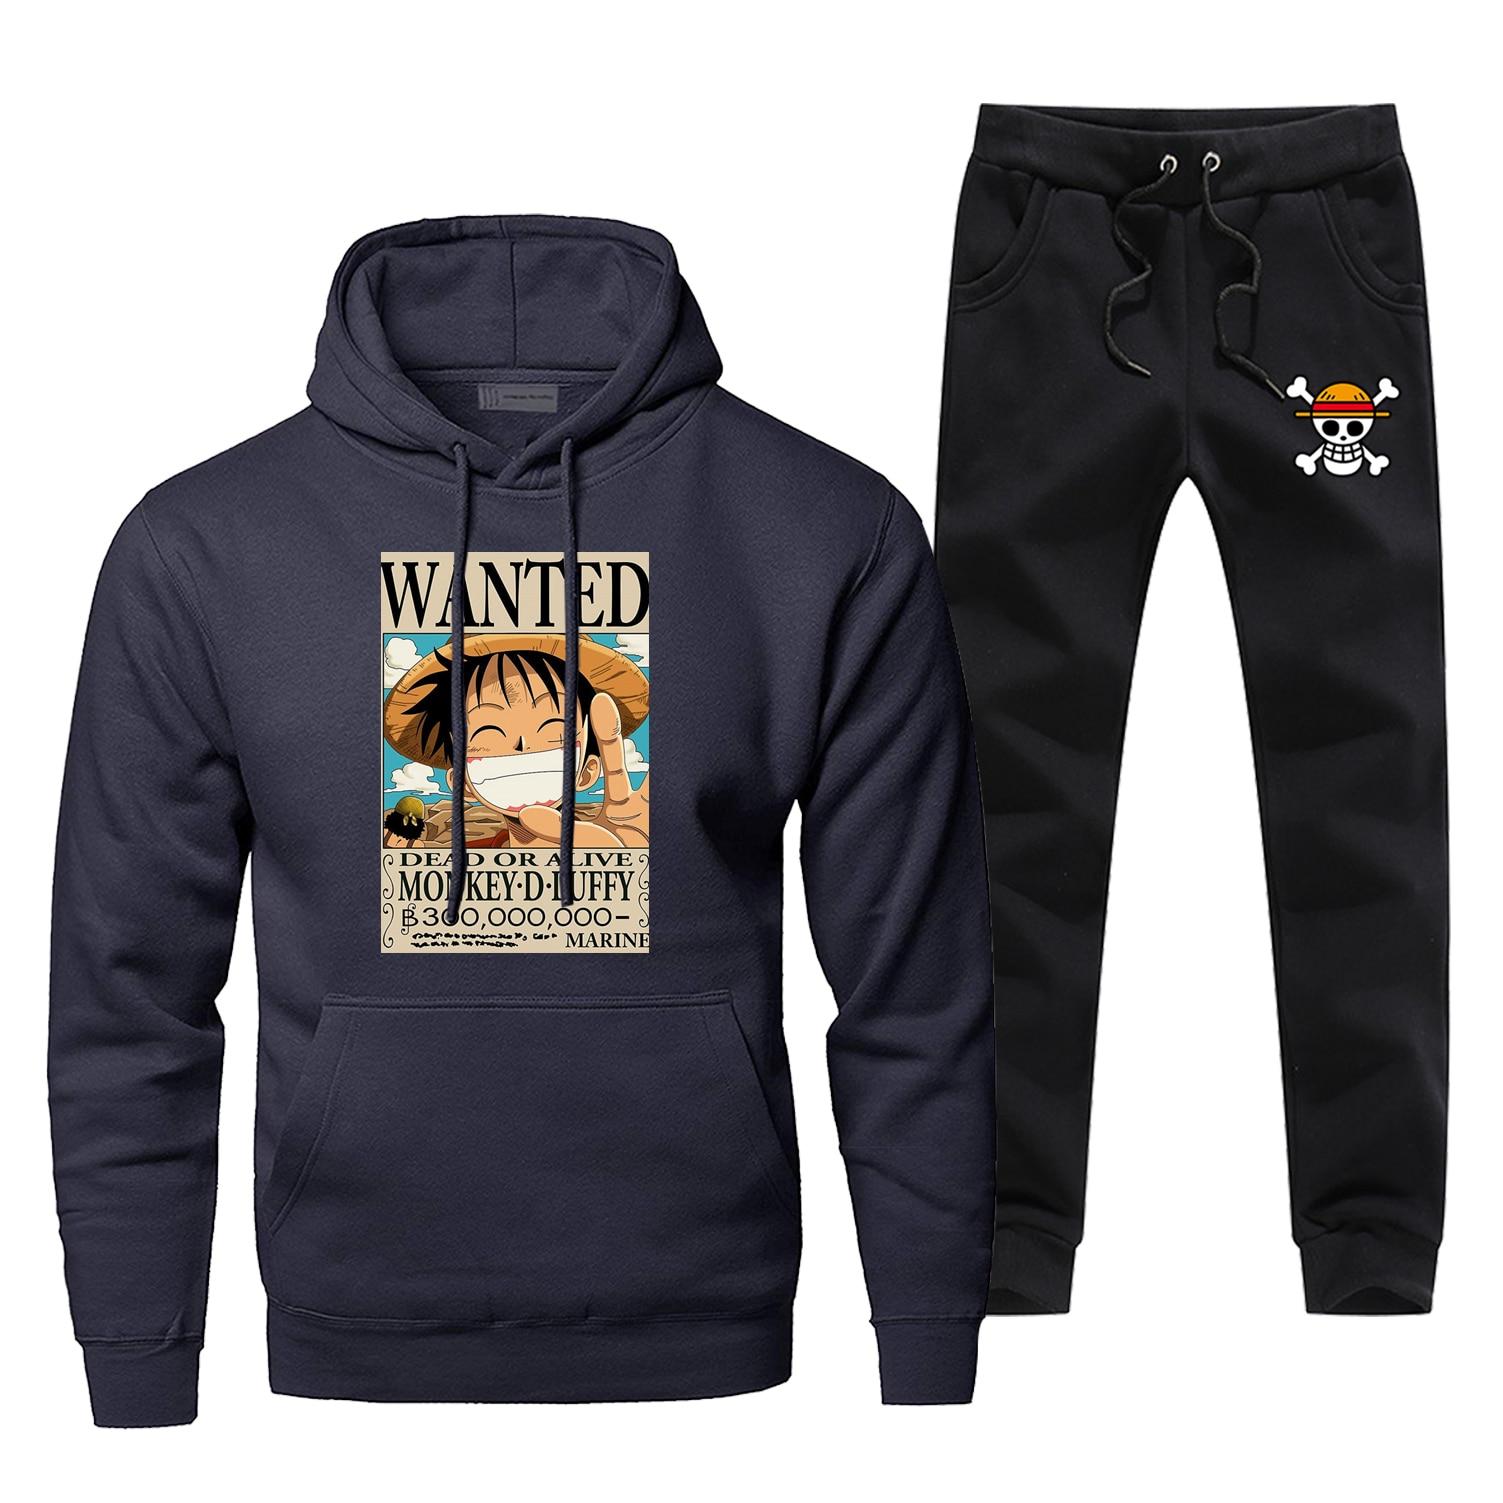 Japanese Anime One Piece Hoodies DEAD OR ALIVE Print Sweatshirt Luffy Wanted Hoodie+pants Sets Men Fleece Sportswear Sweatpants